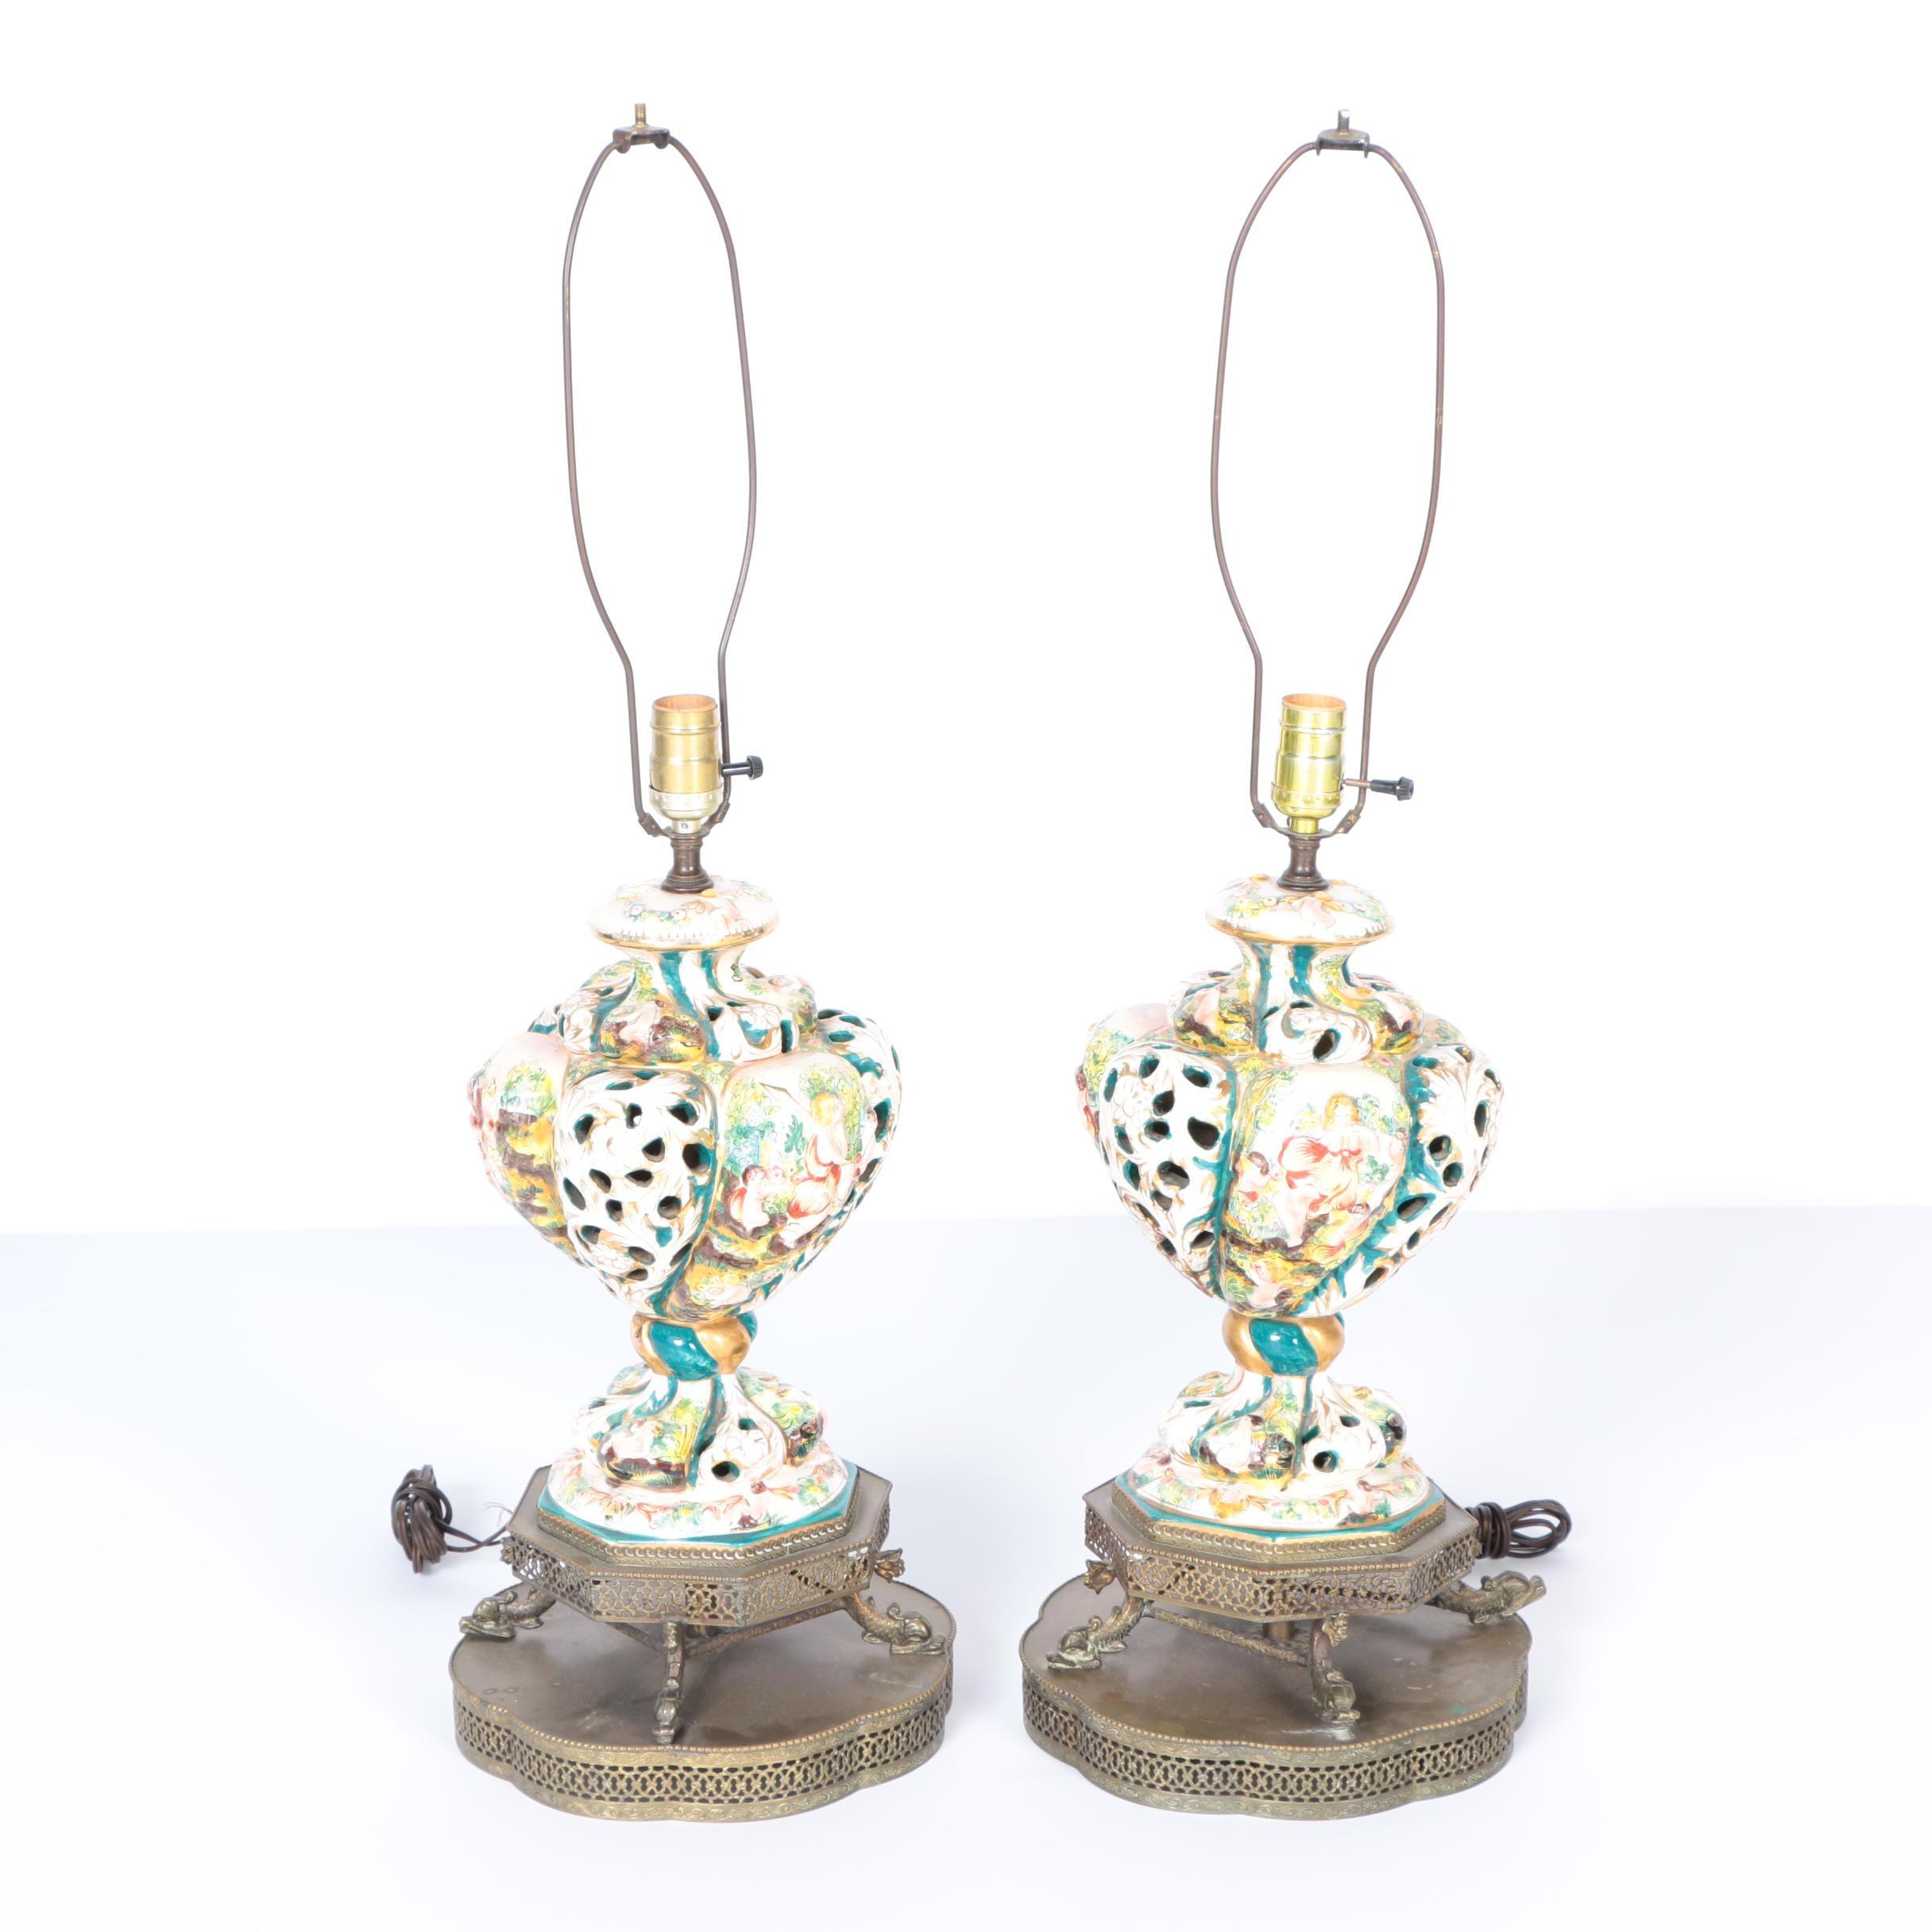 Vintage Capodimonte Style Porcelain Table Lamps